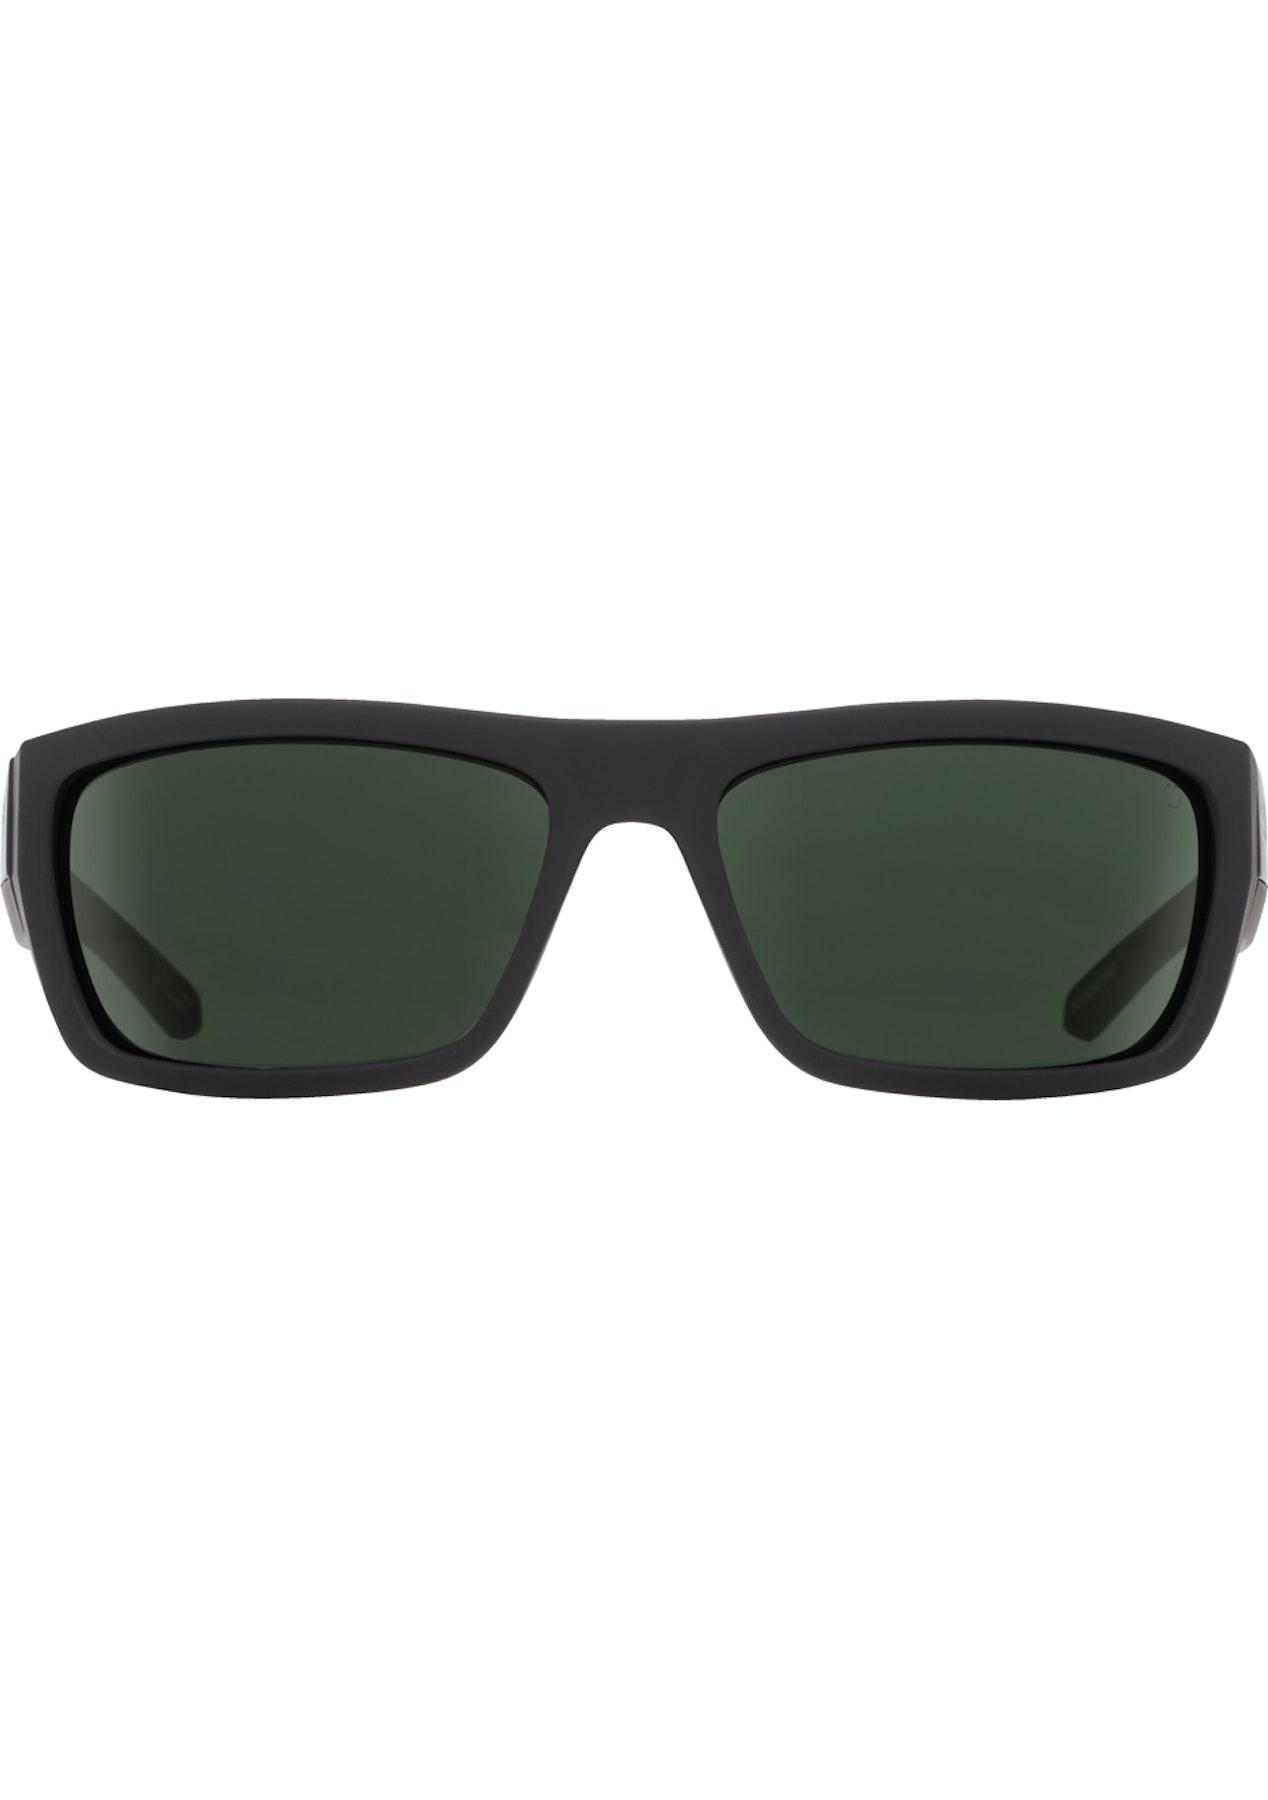 d3aca72189 Spy Dega Sunglasses - Soft Matte Black - Happy Grey Green - Quay Eyewear    More - Onceit